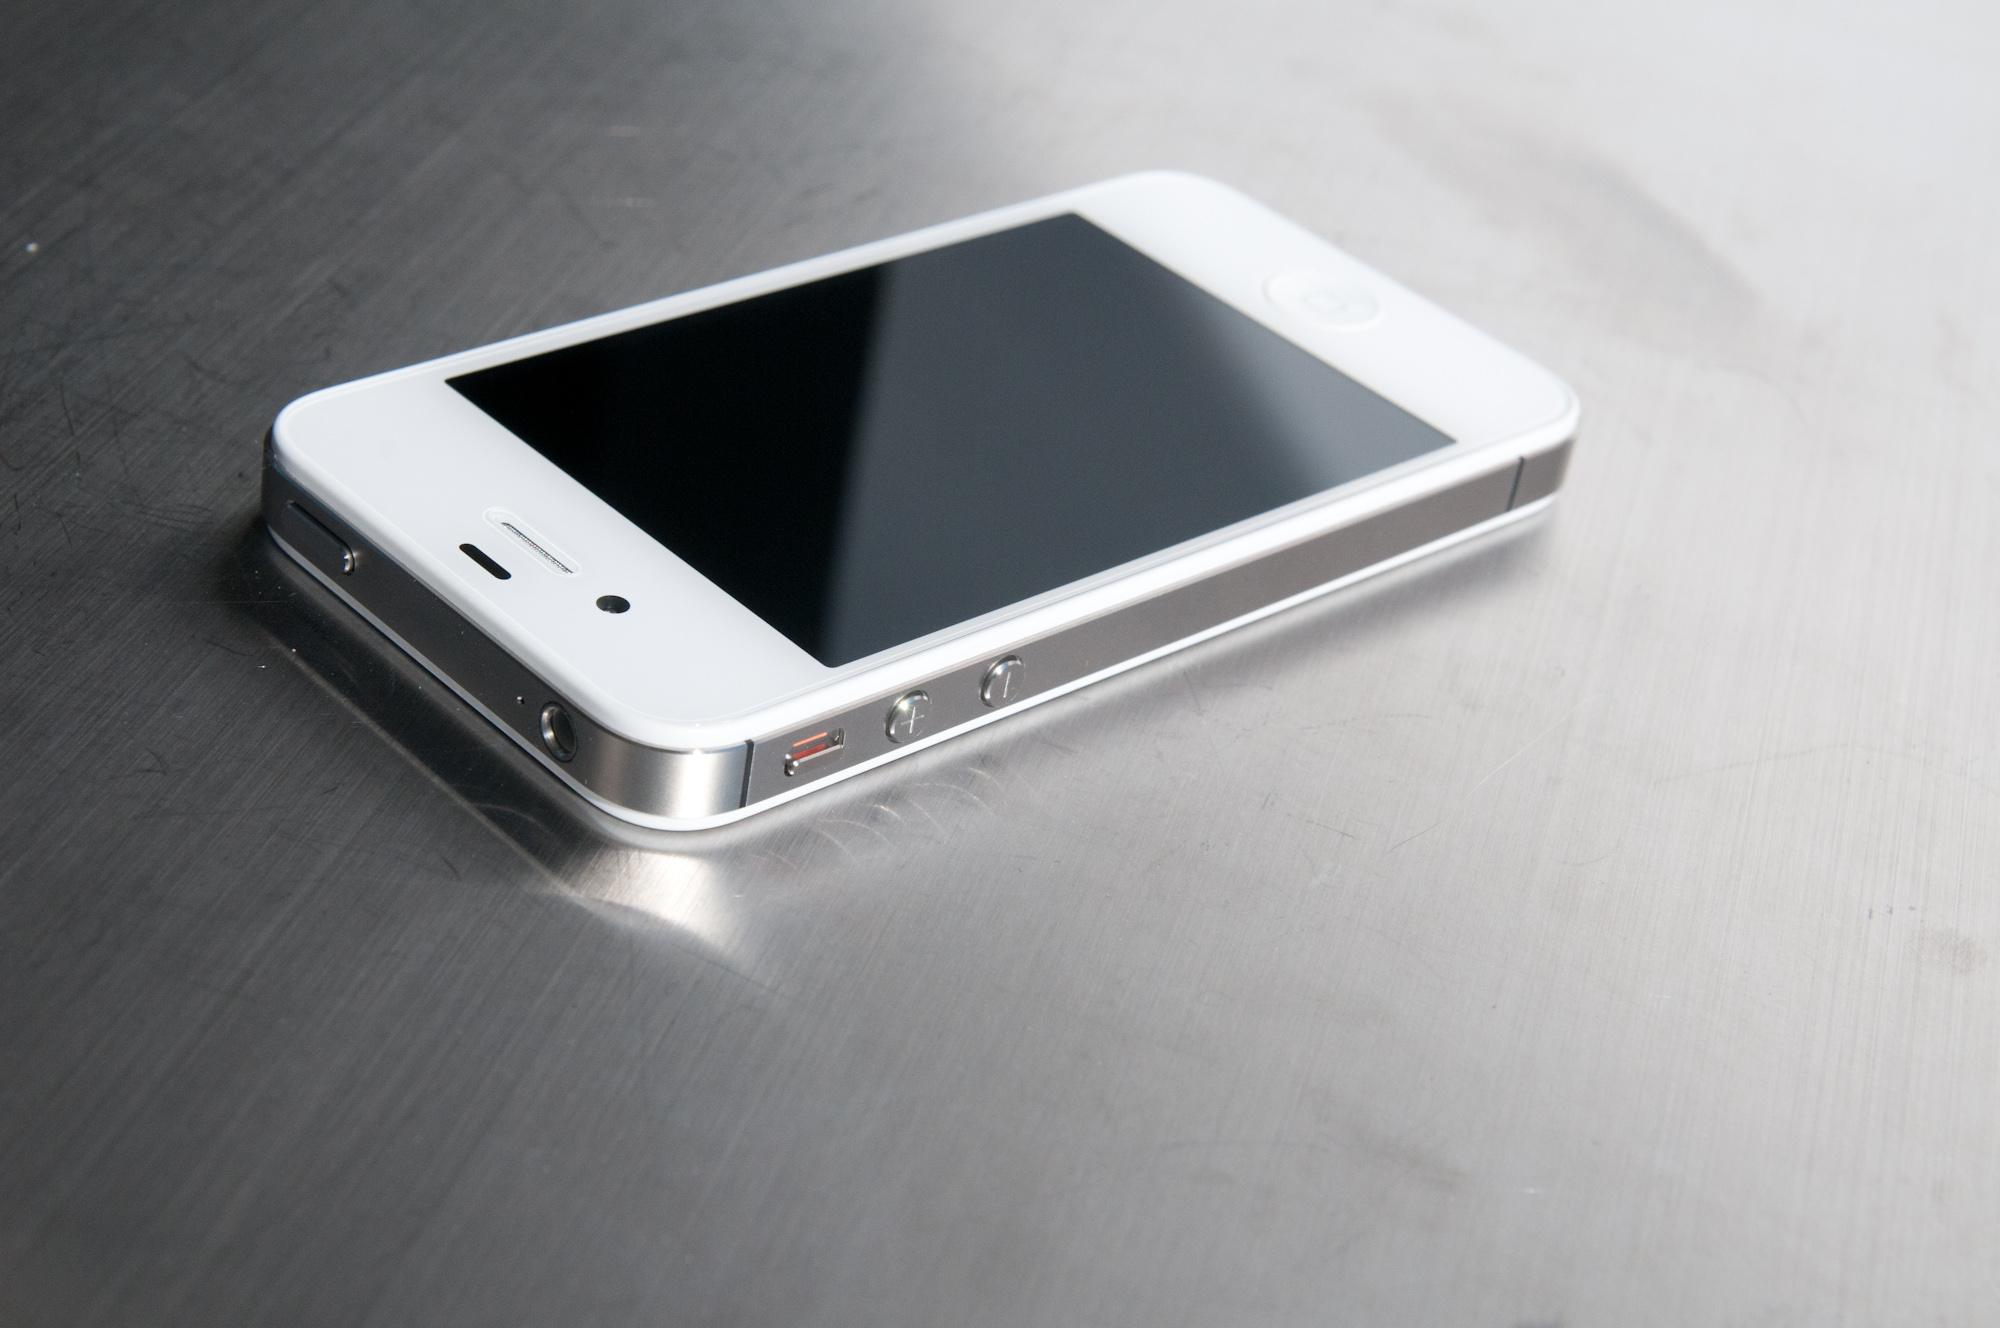 Iphone 4s radiation test - Altermedicine org